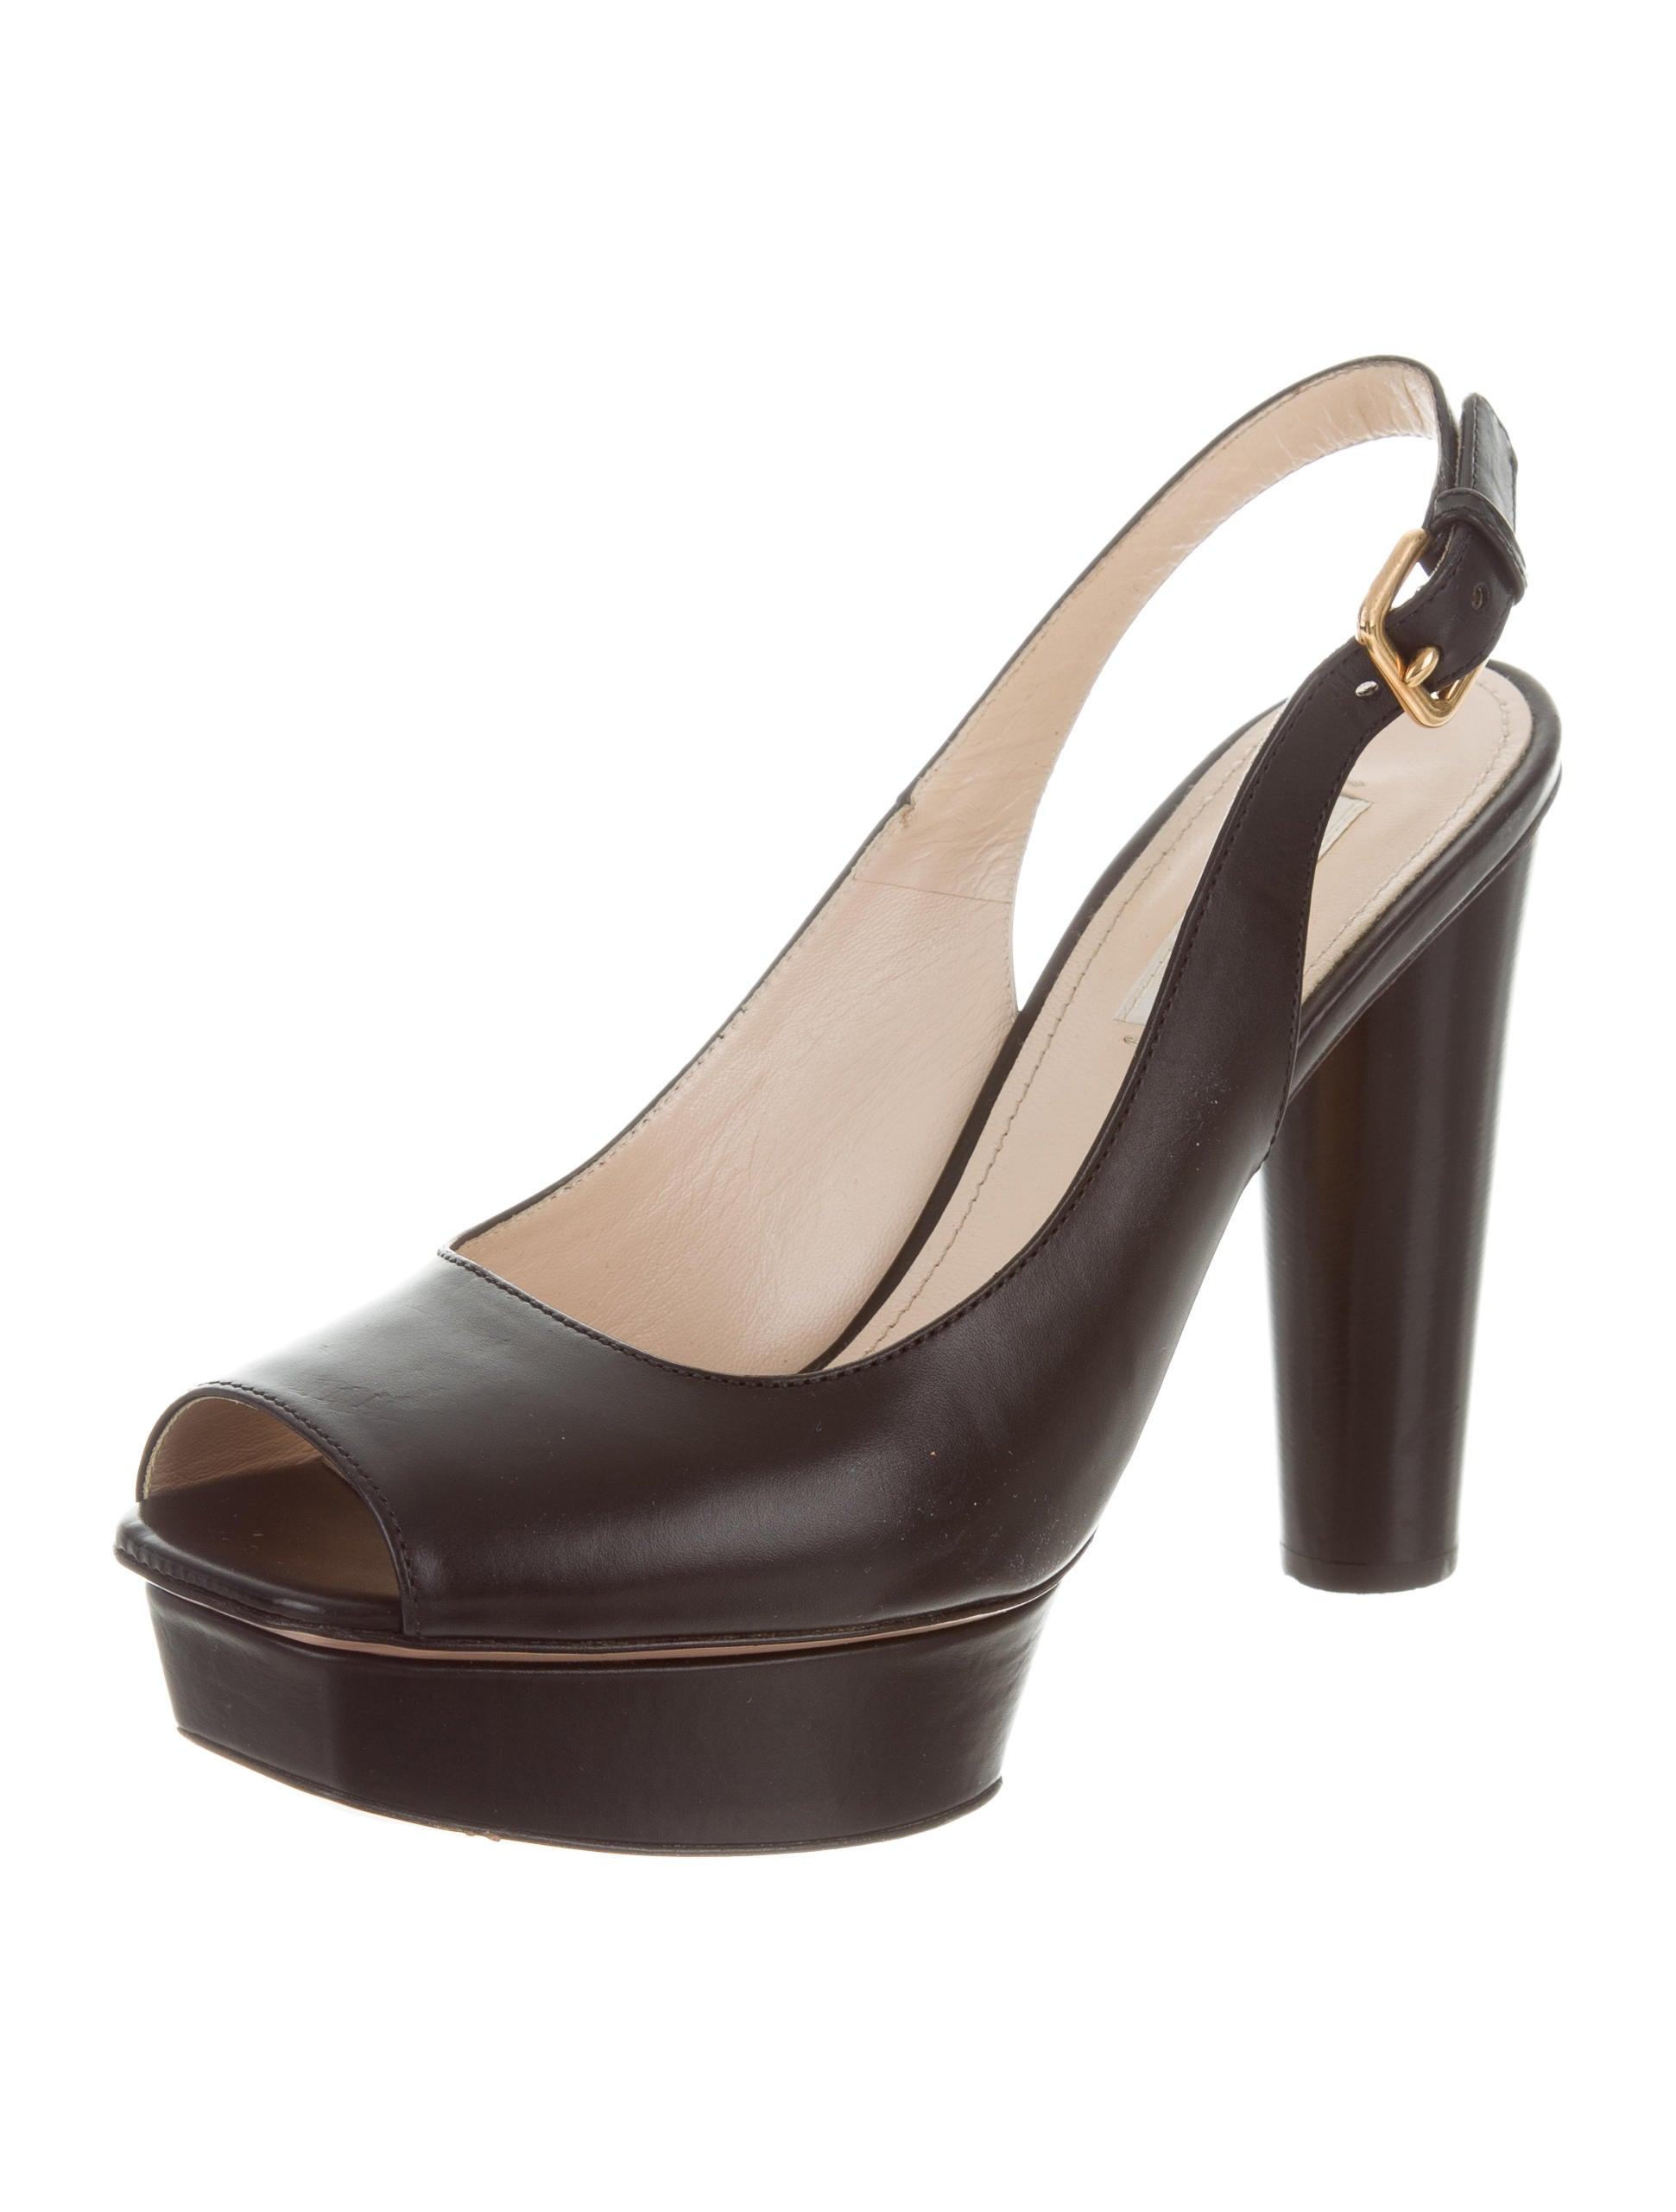 Prada Peep-Toe Slingback Pumps - Shoes - PRA158063 | The RealReal